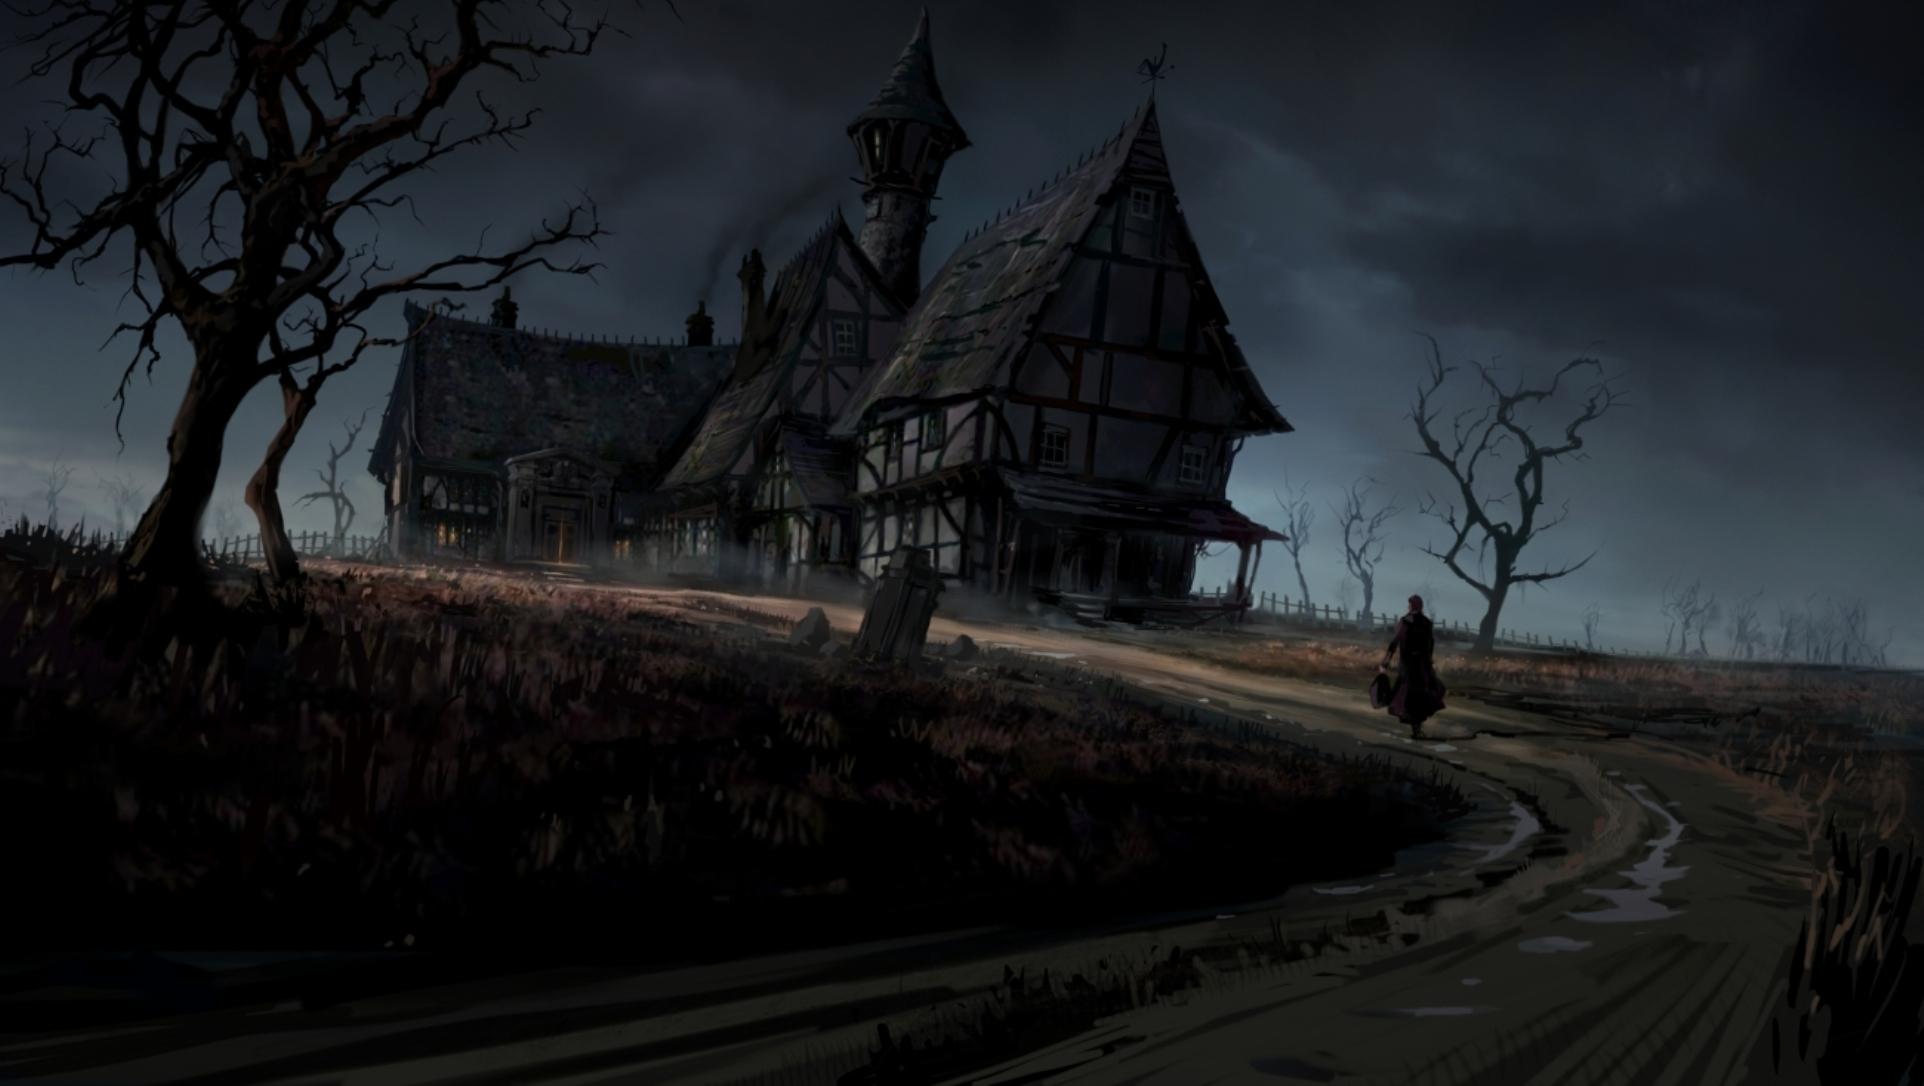 Dark haunted horror gothic house storm rain art wallpaper 1924x1086 1924x1086